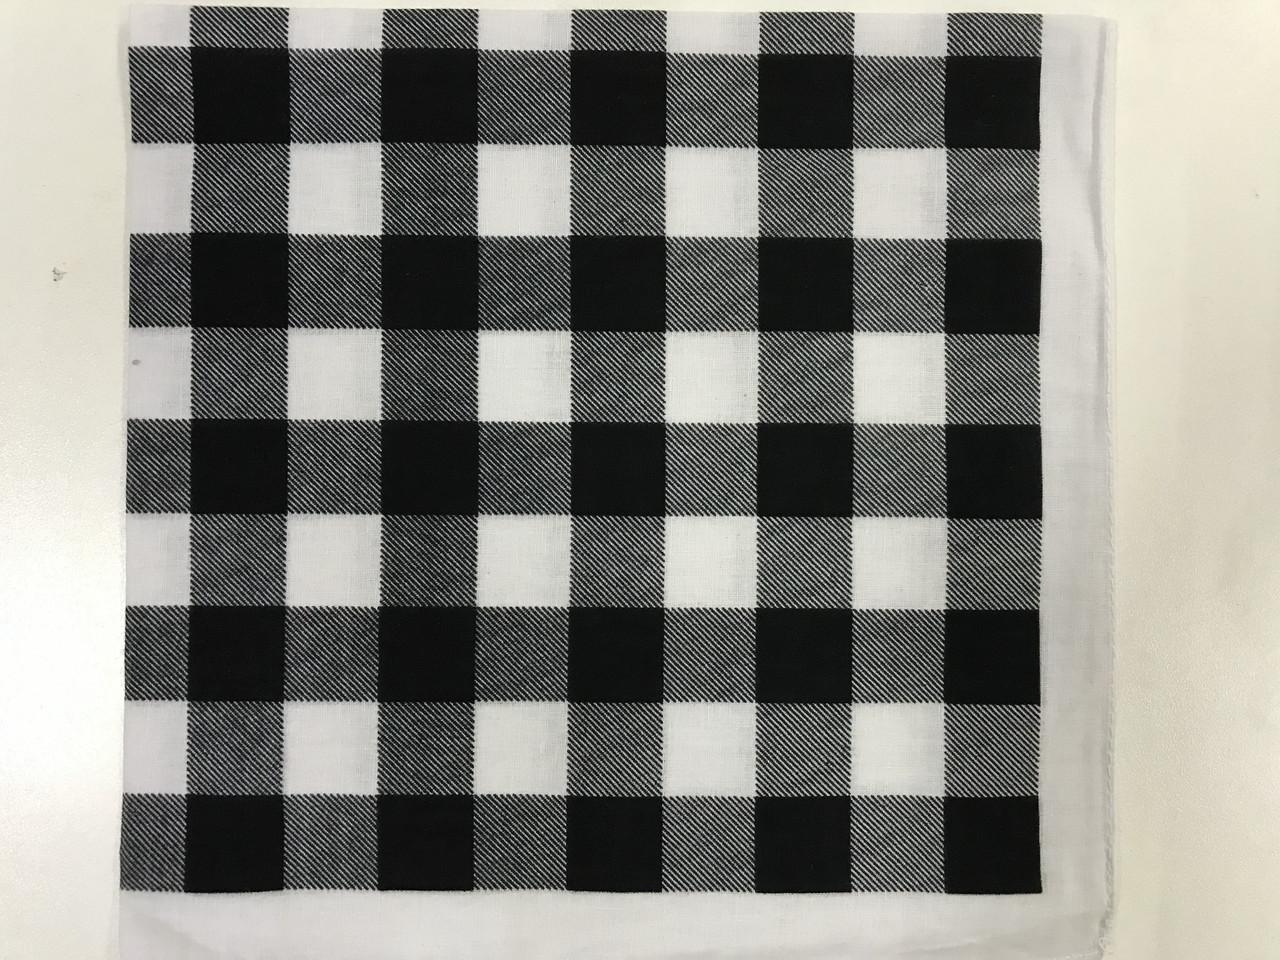 Бавовняна бандана (косинка) чорно-біла